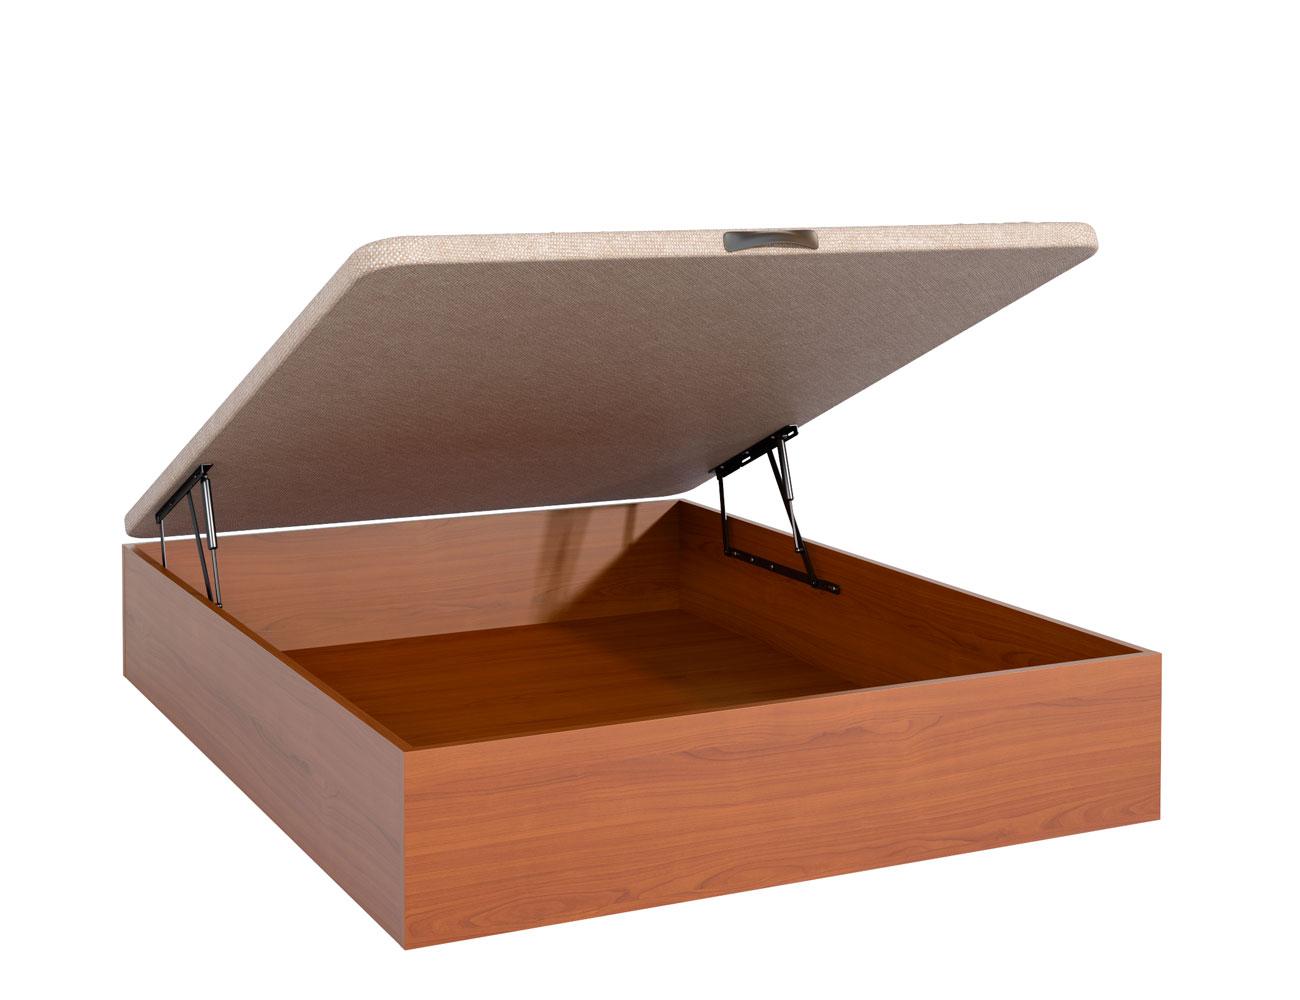 Canape madera nogal tapa 3d barato tajo abierto2